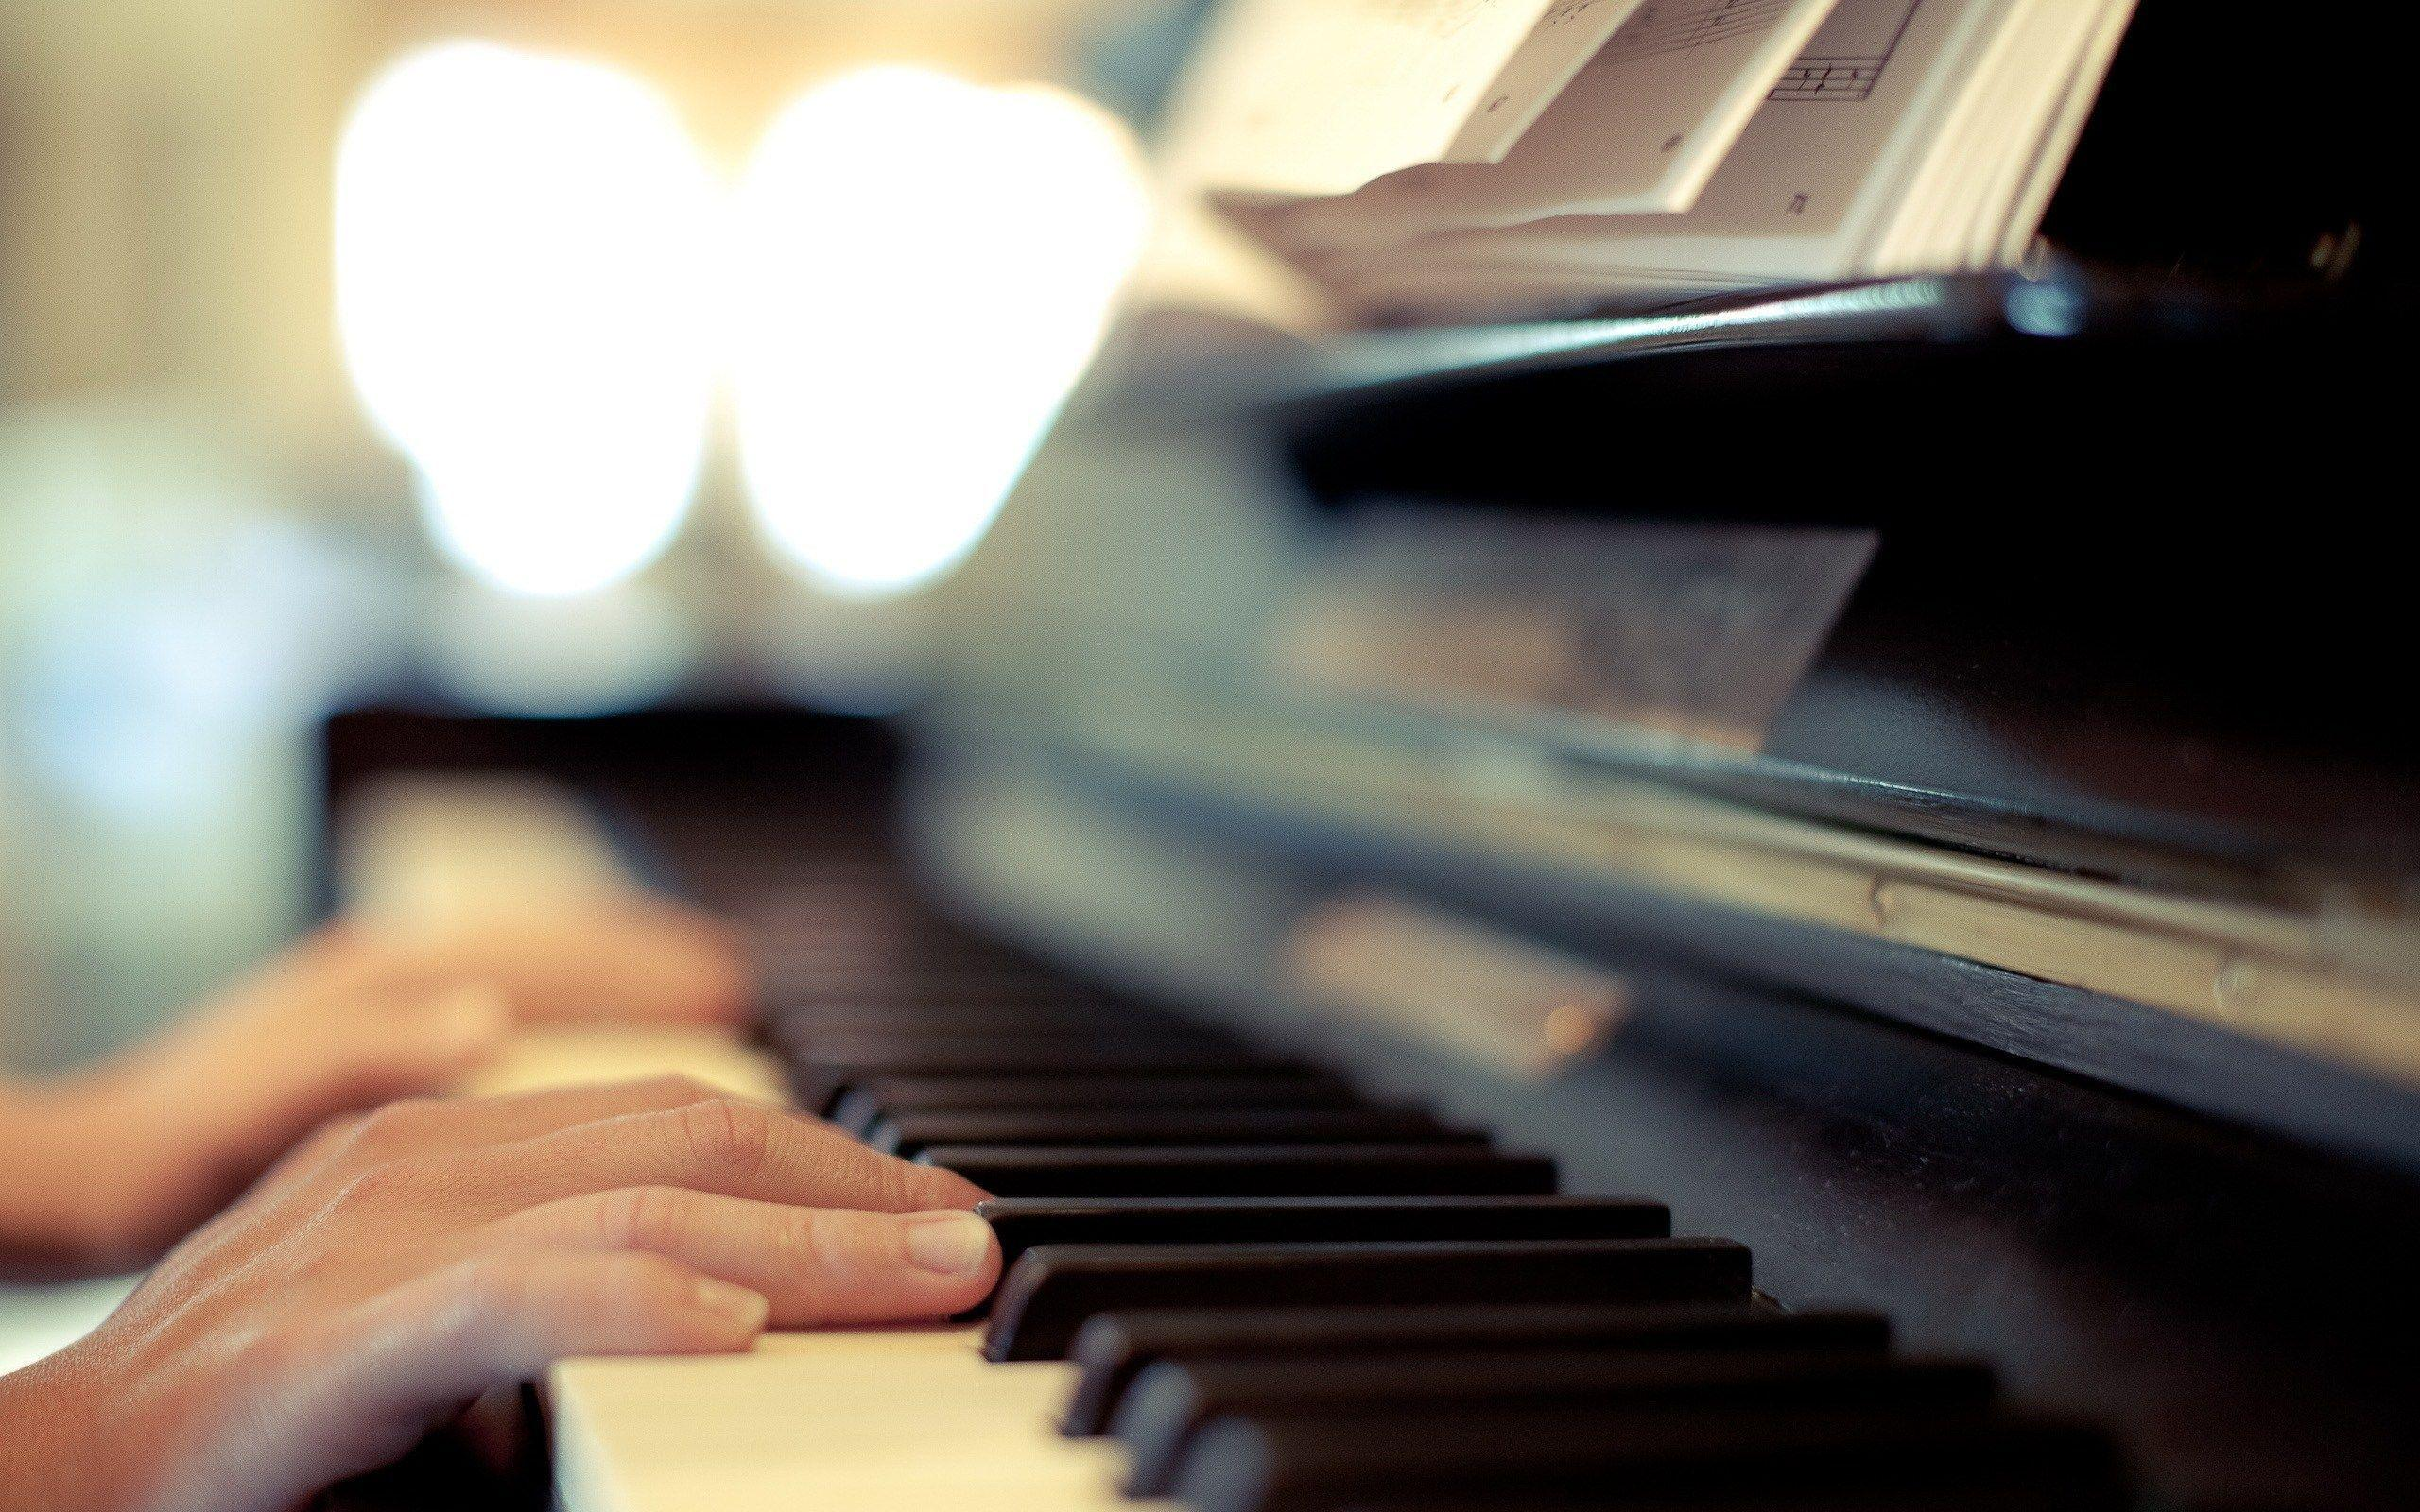 Photo Music Piano Hd Wallpaper | Wallpaper List